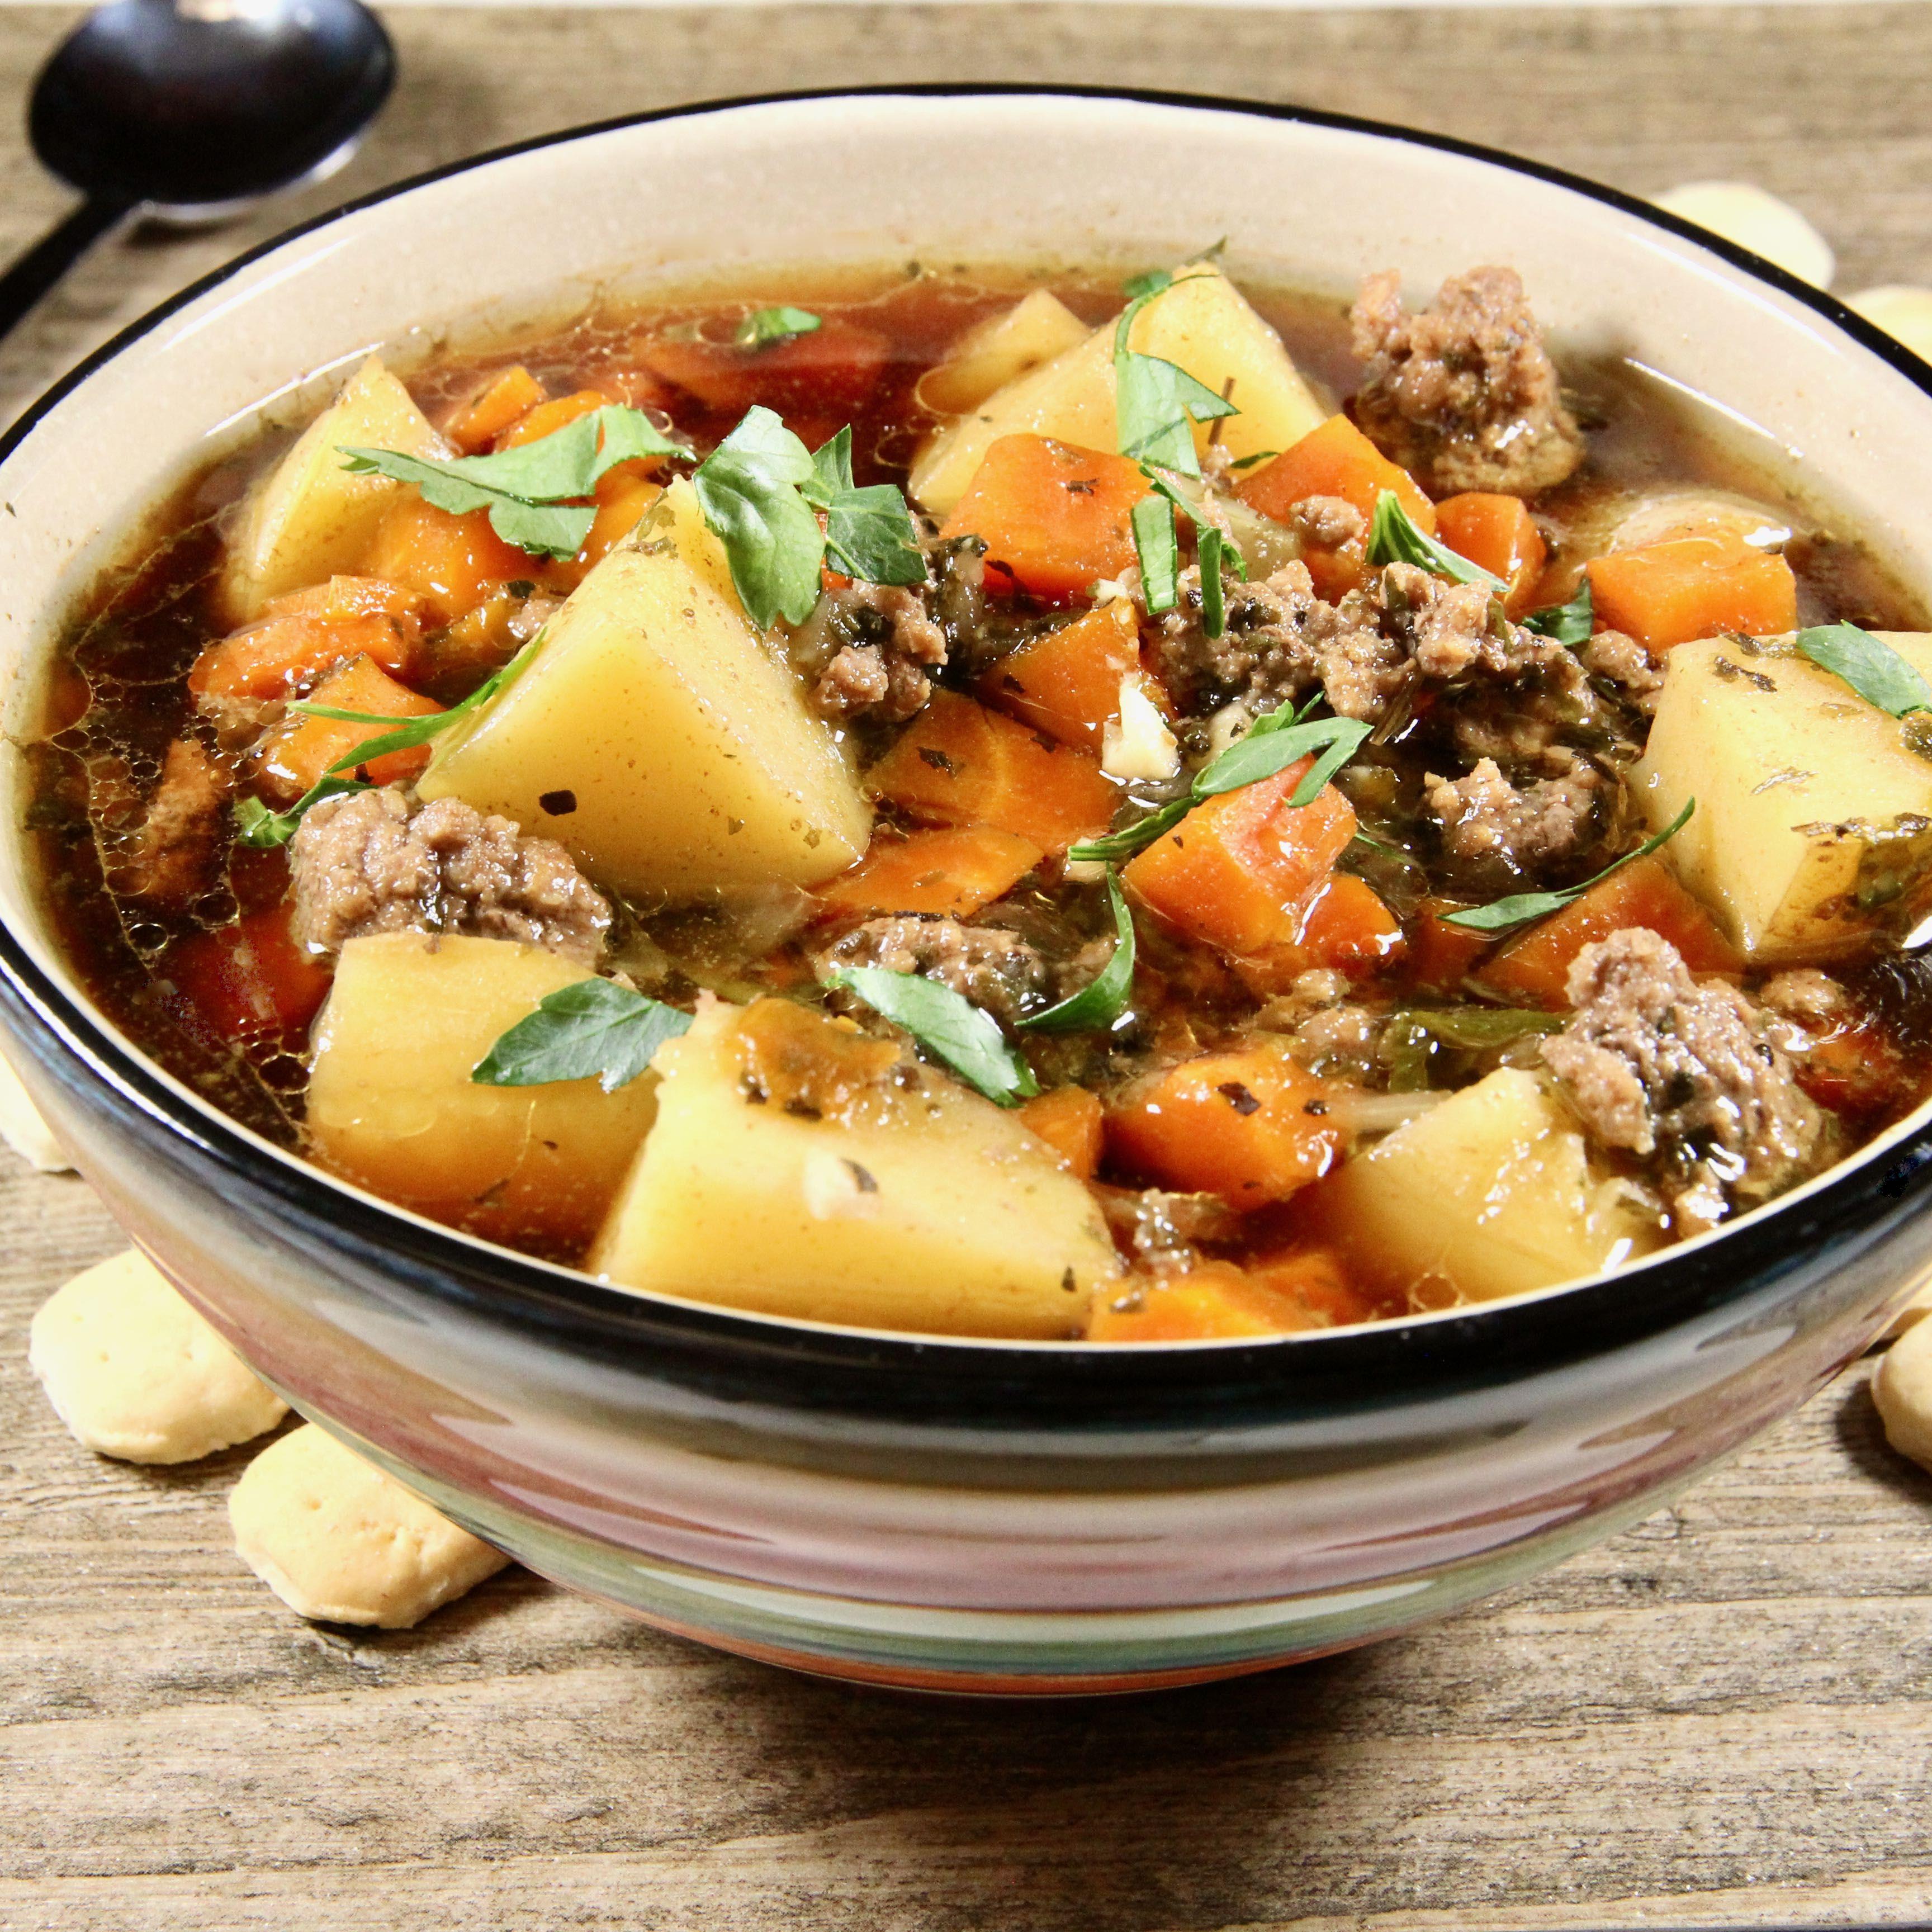 My Mom S Hamburger And Potato Soup Recipe In 2020 Hamburger And Potatoes Potato Soup Soup Recipes